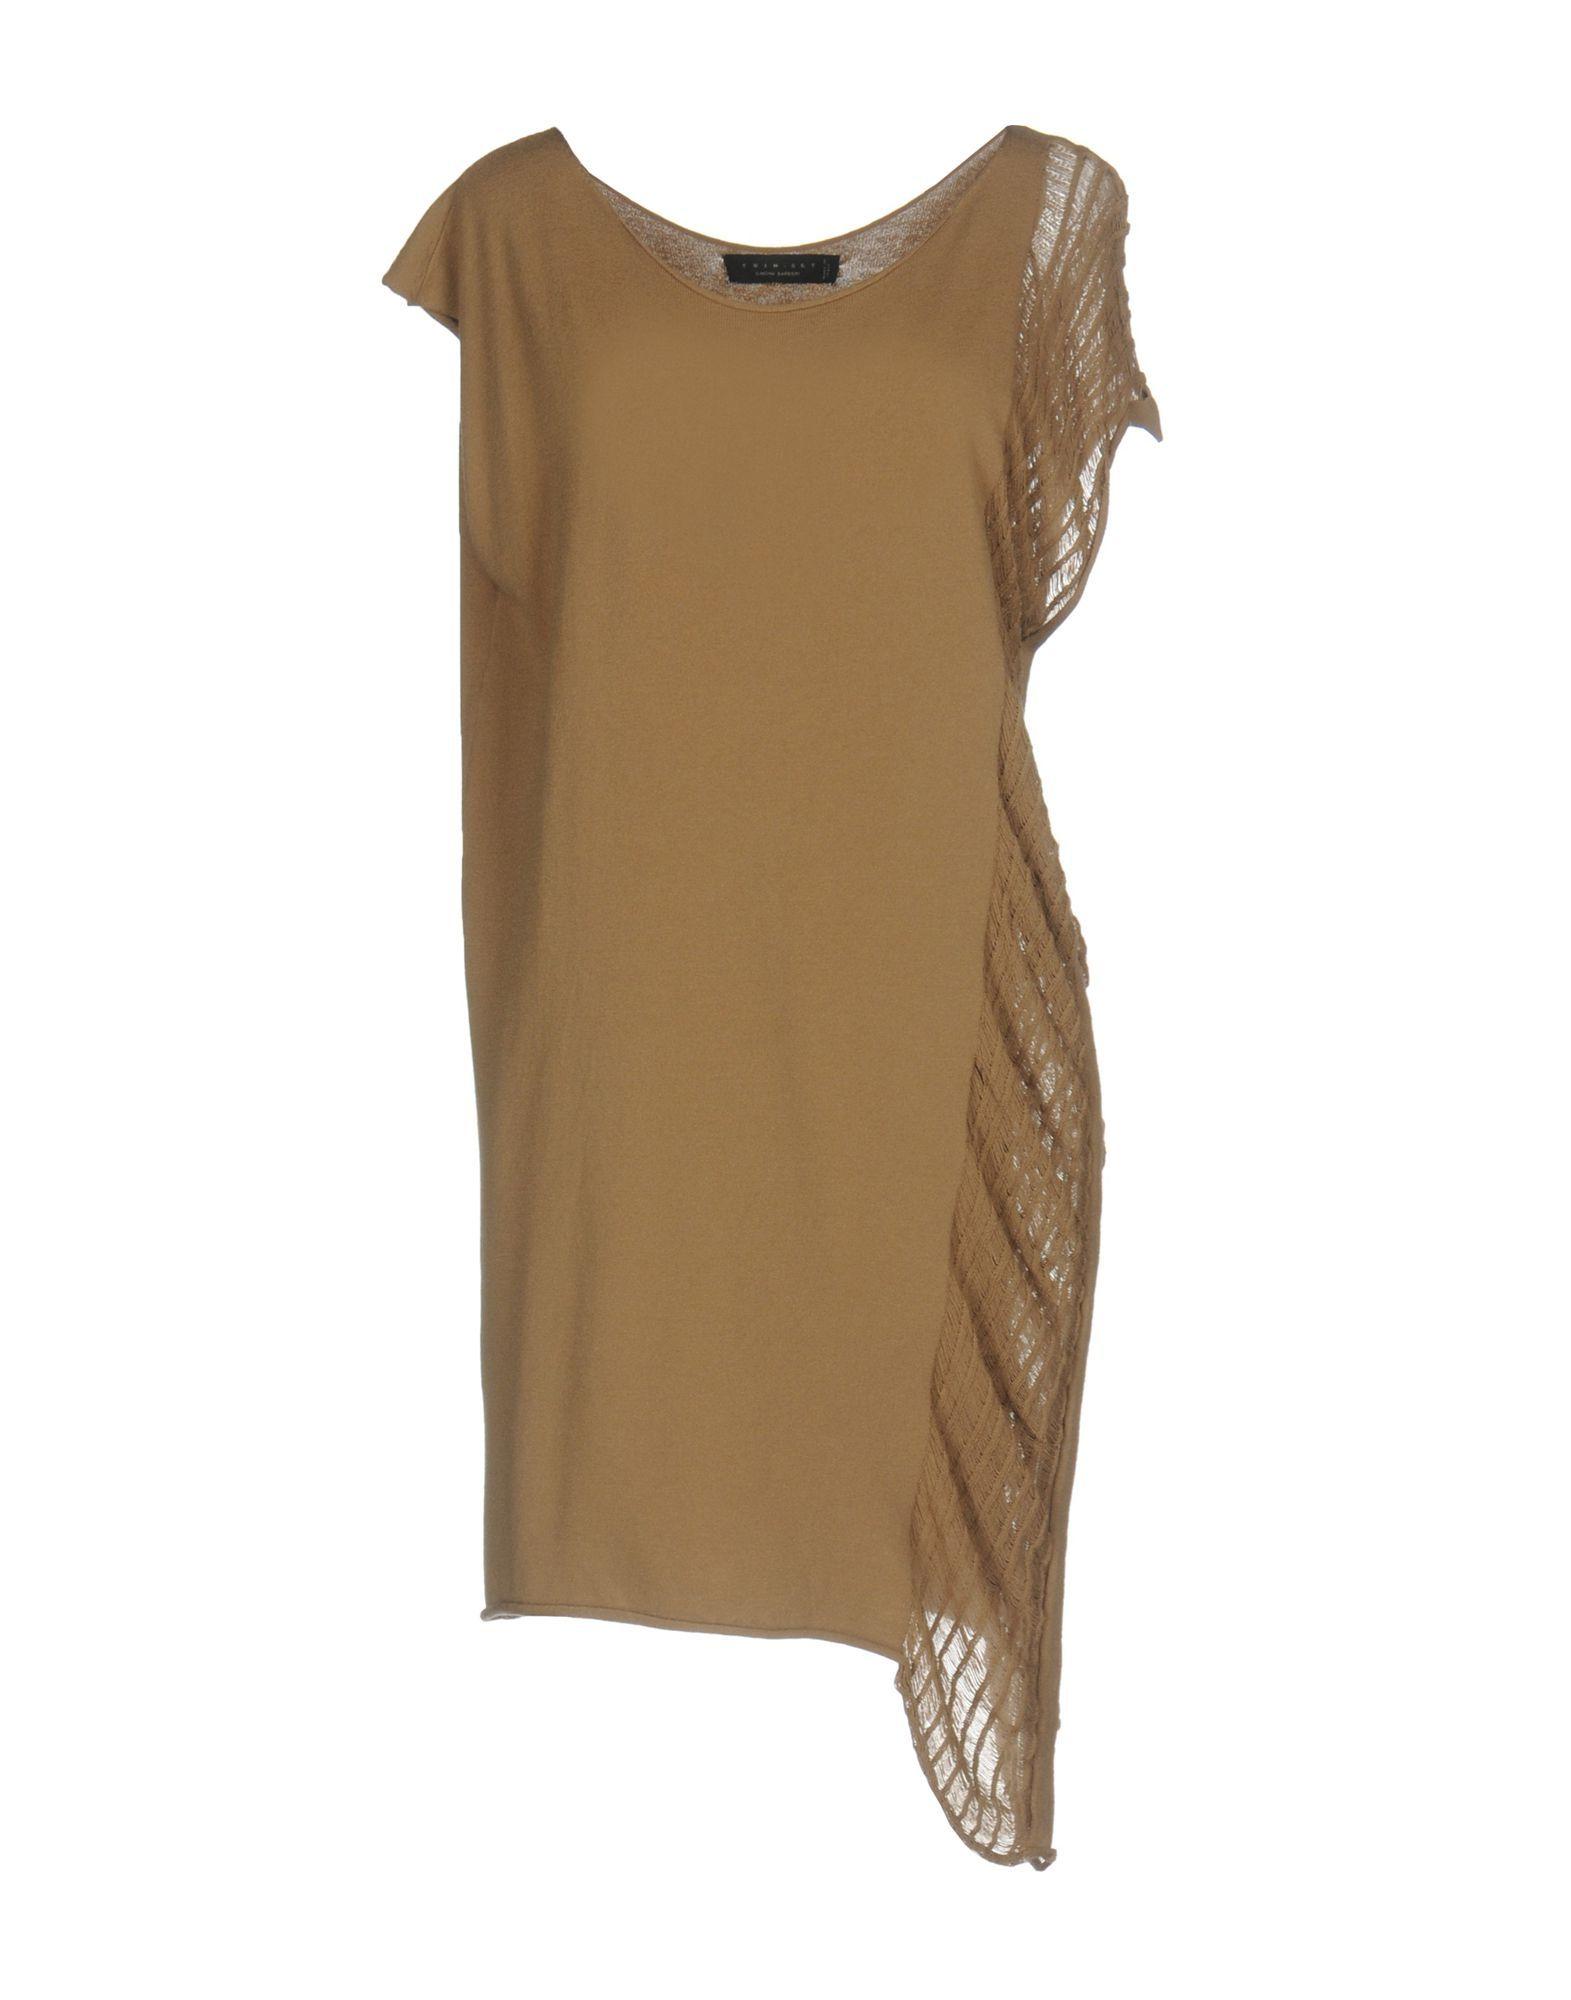 Twinset Khaki Knit Short Dress